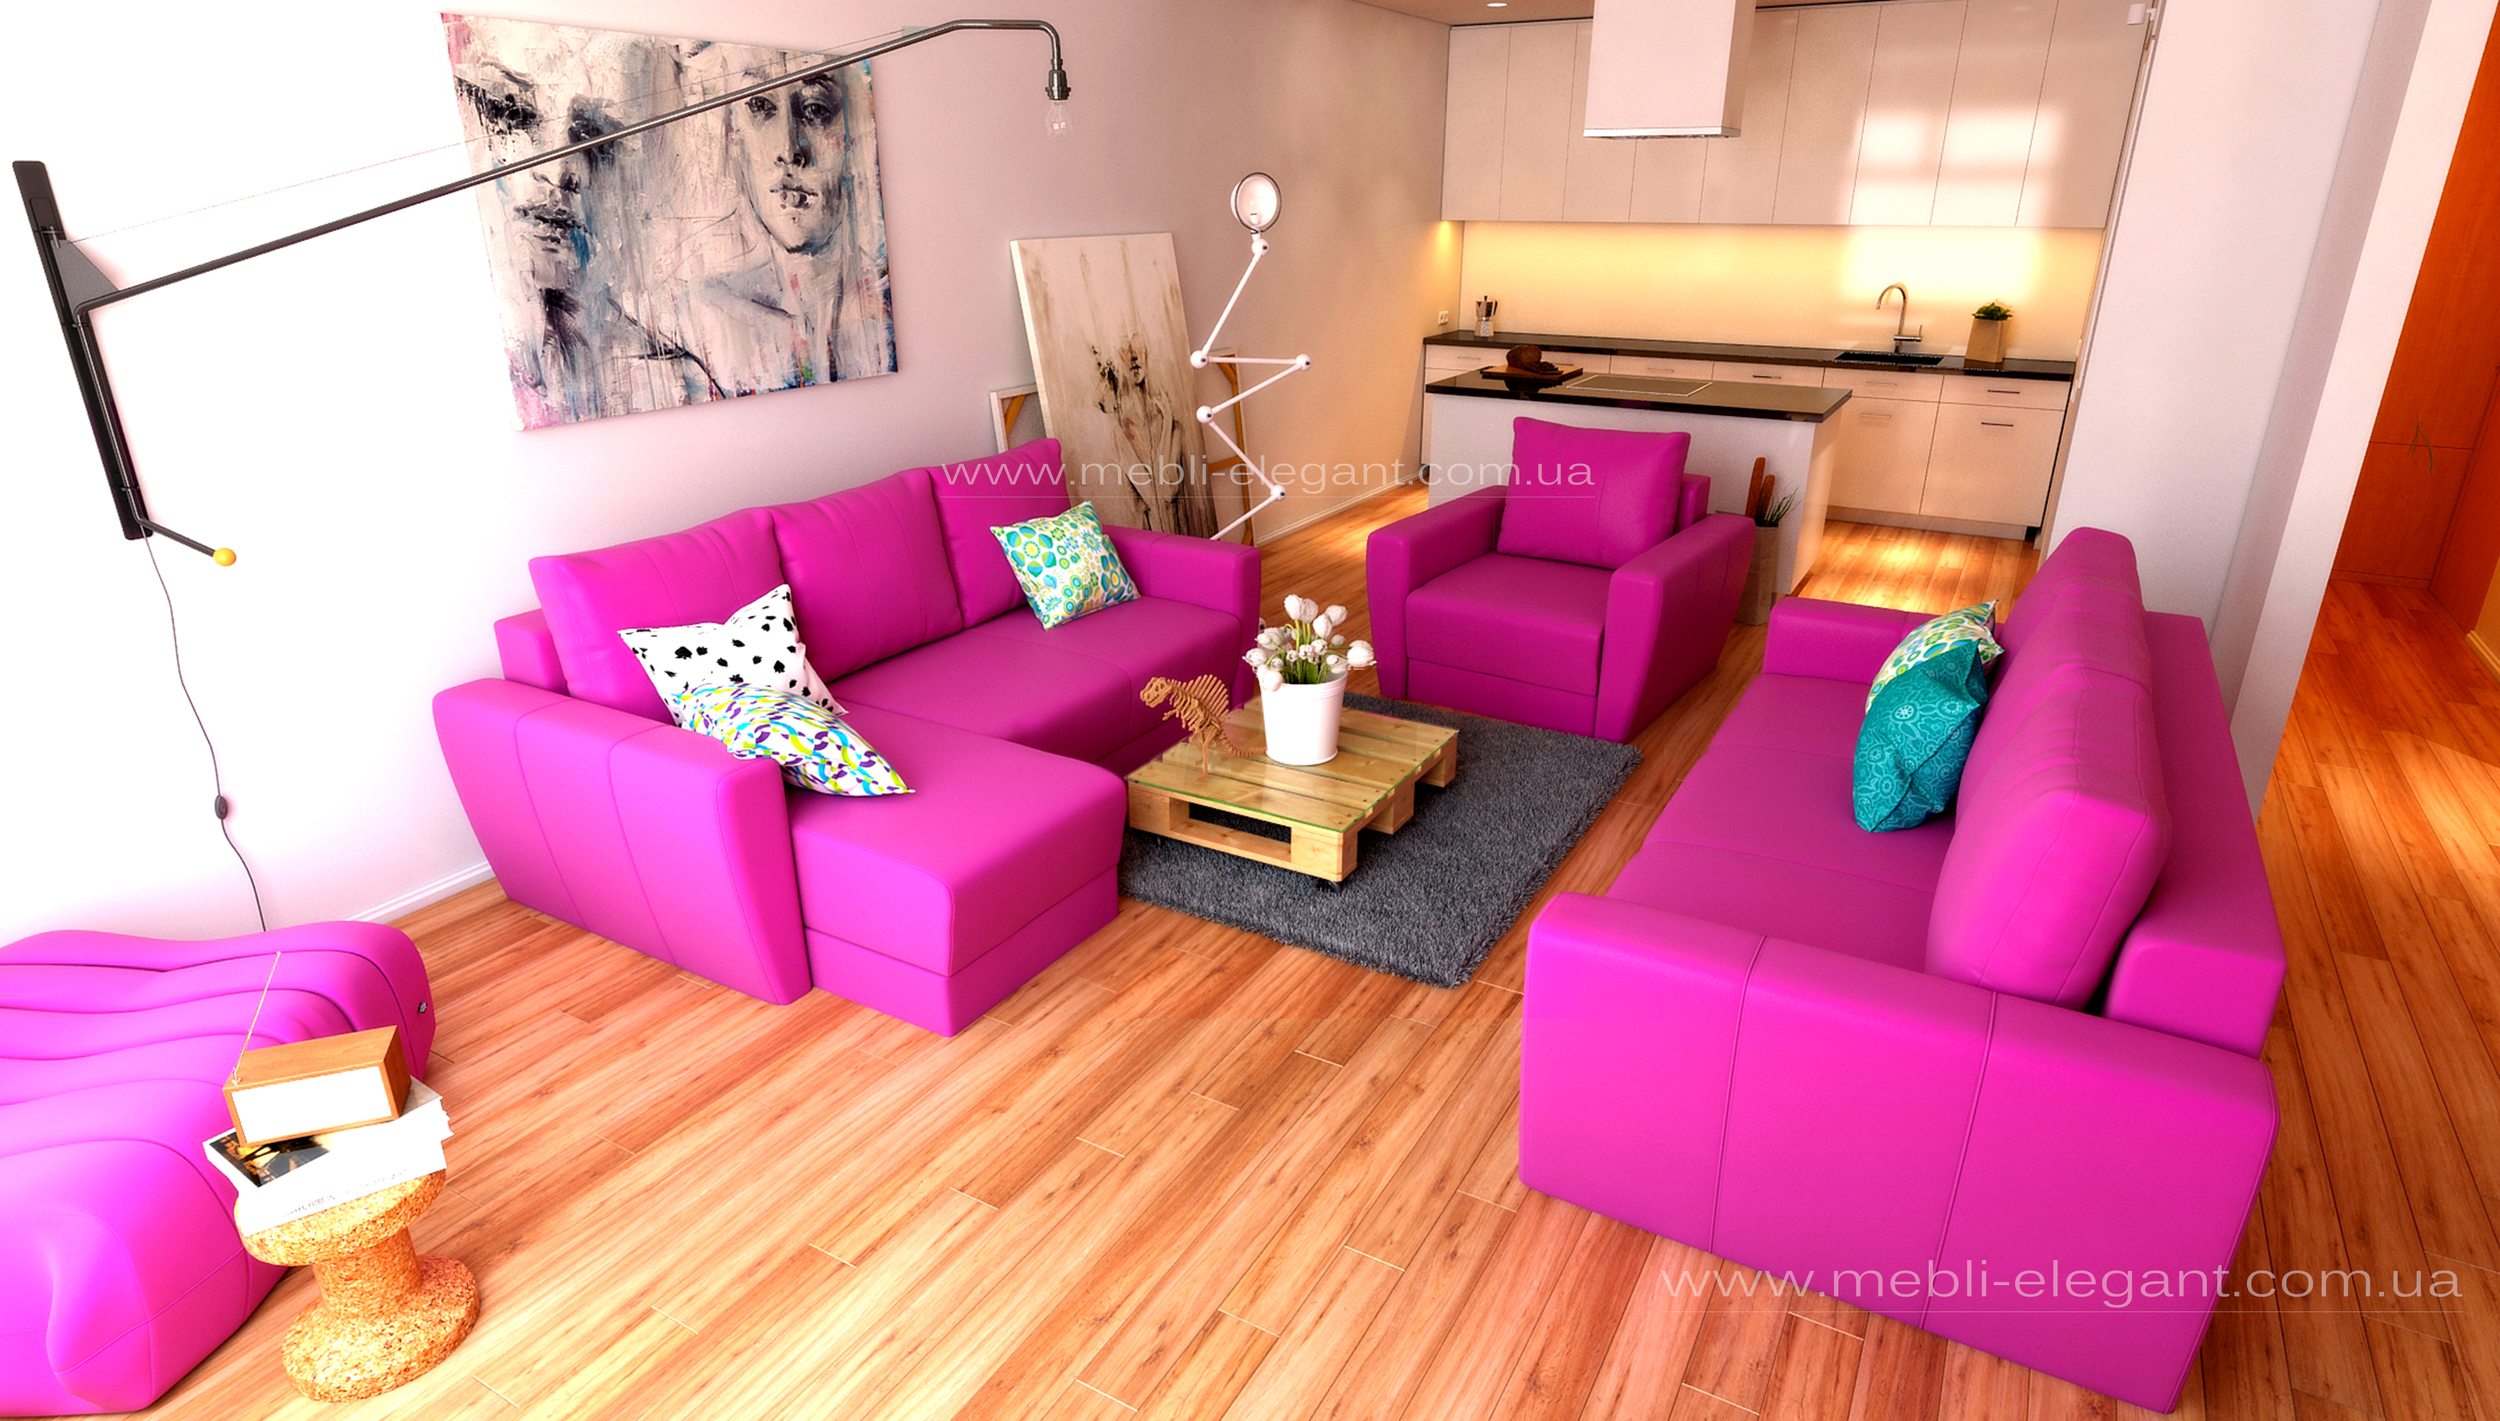 Miami_interior2 300.jpg